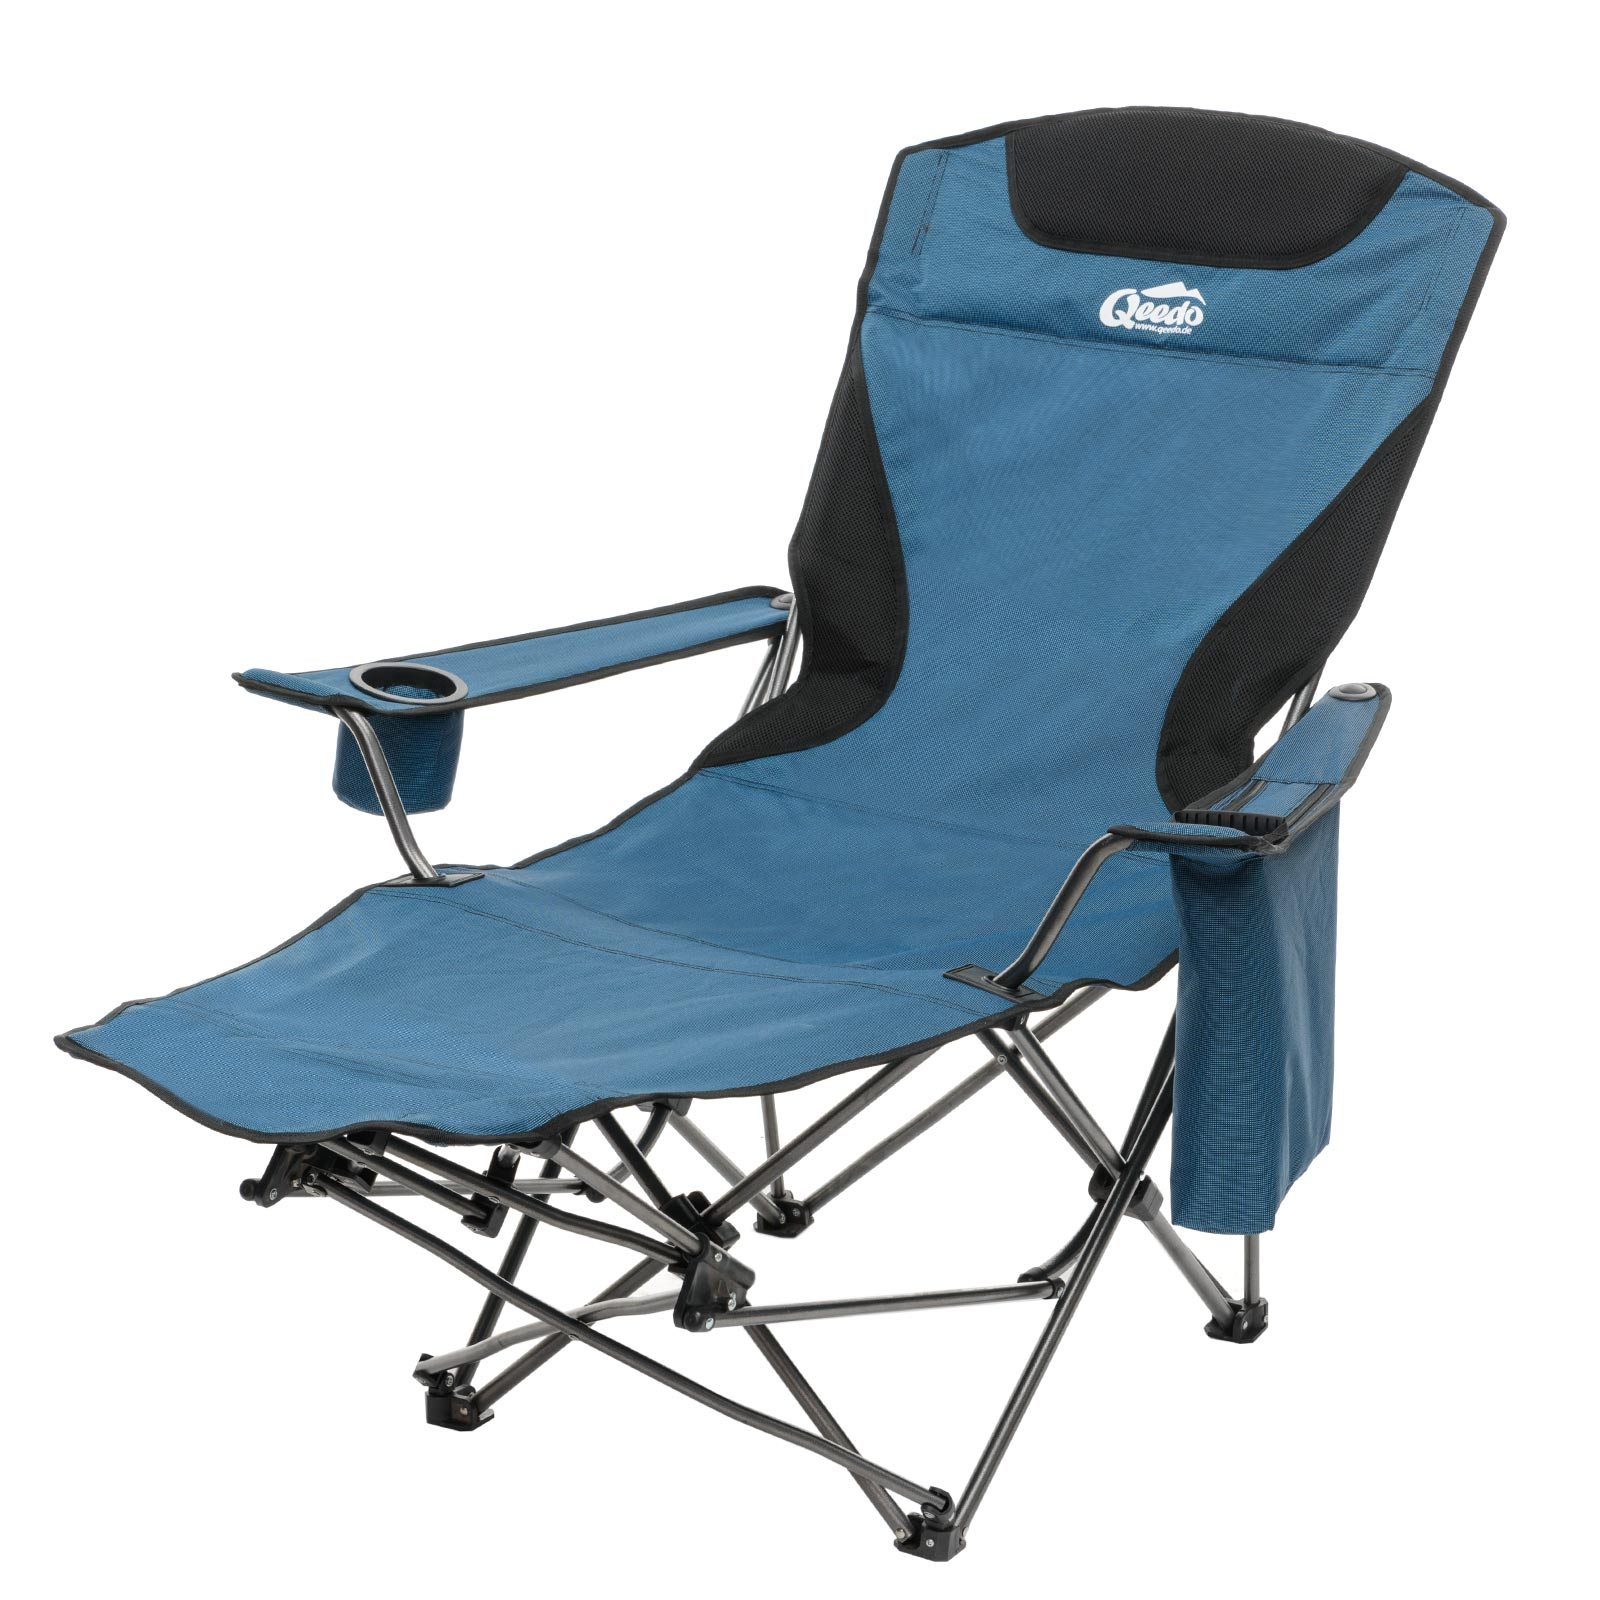 faltstuhl qeedo johnny relax campingstuhl mit fu st tze. Black Bedroom Furniture Sets. Home Design Ideas